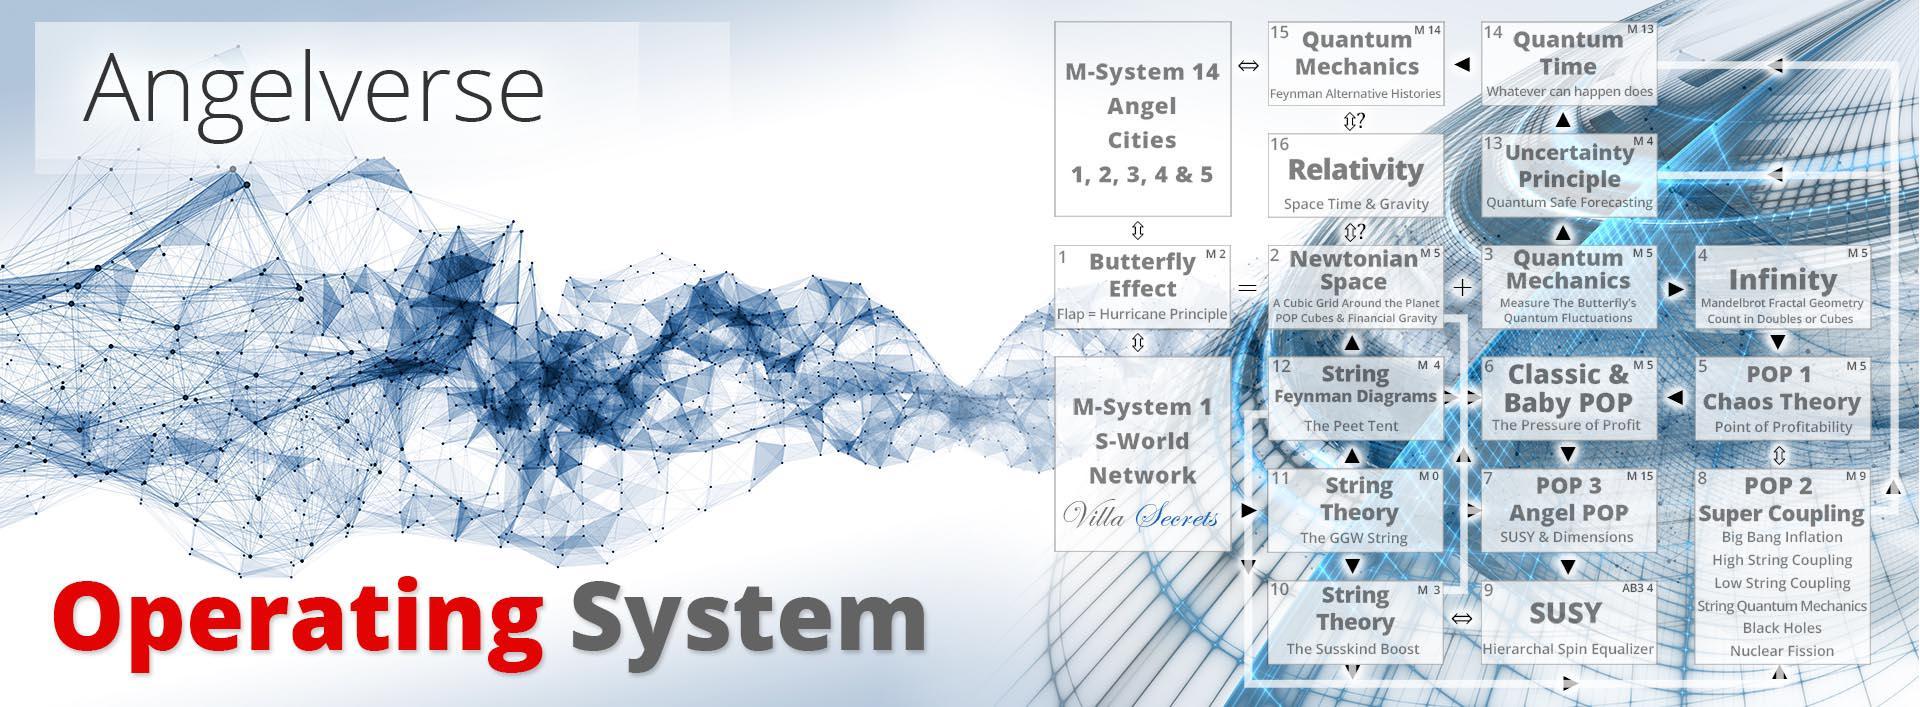 Angelverse Operating System